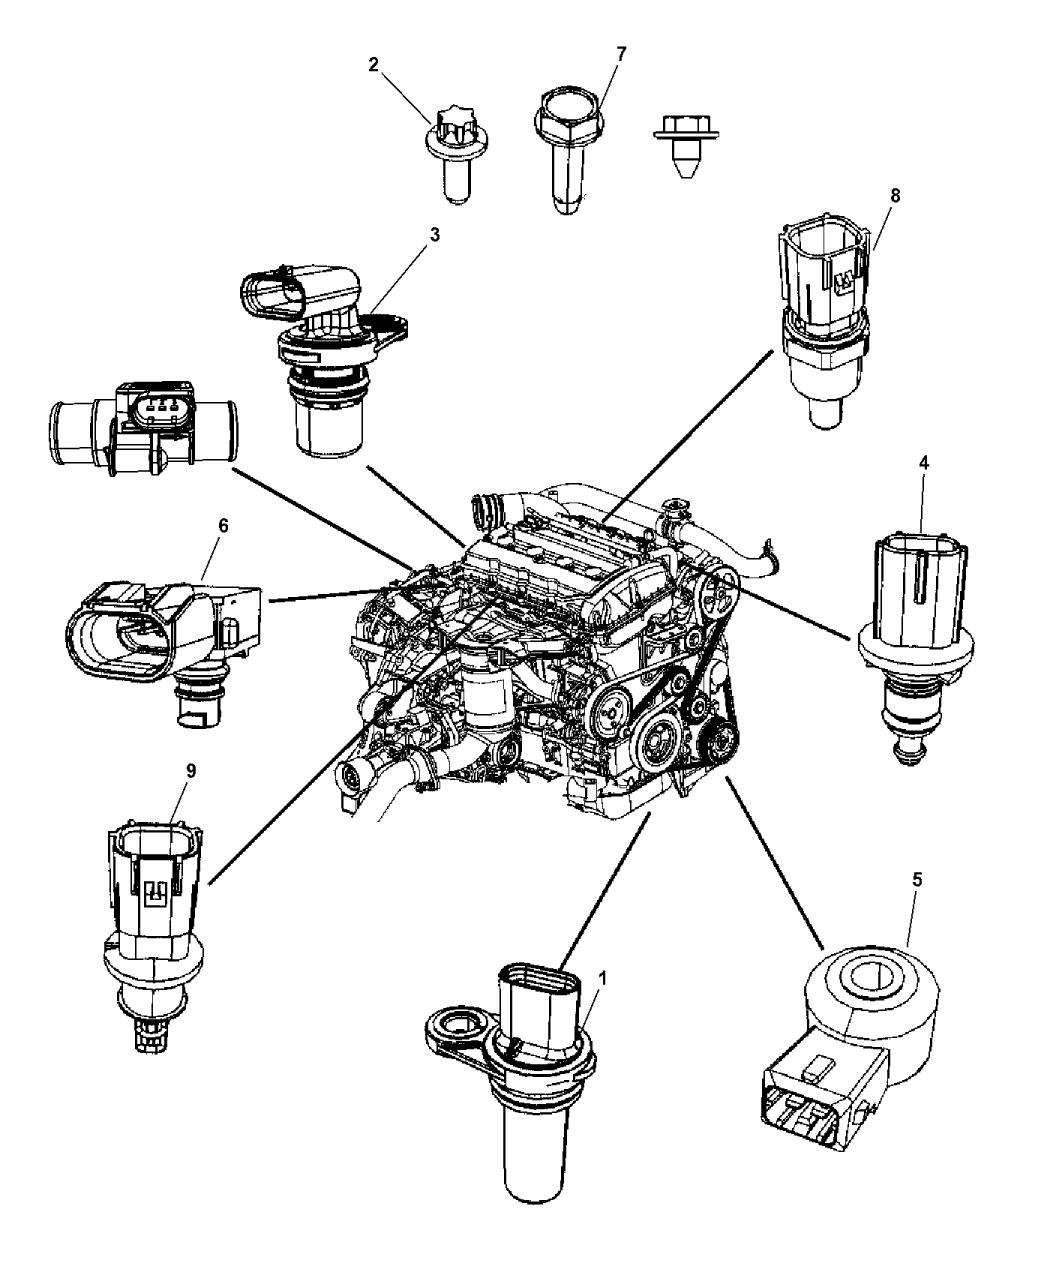 wiring diagram jeep patriot 2011 2011 jeep patriot sensors engine mopar parts giant  2011 jeep patriot sensors engine